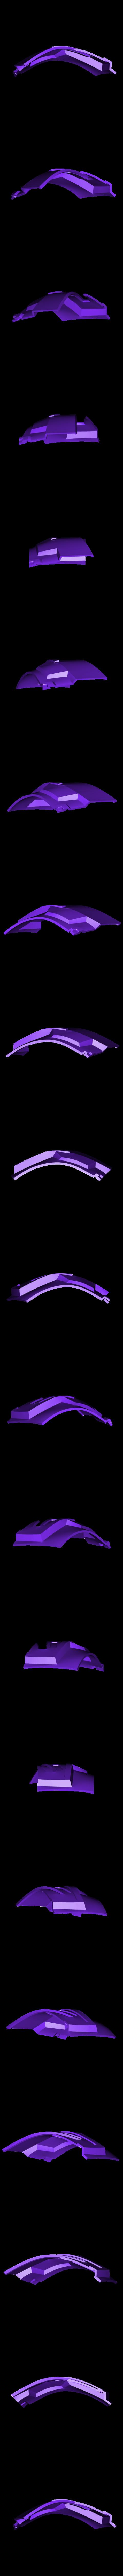 Part_10_v4.stl Download free STL file  Blood Dragon Helmet Mass Effect 2 (With Back Access) • 3D printable template, VillainousPropShop